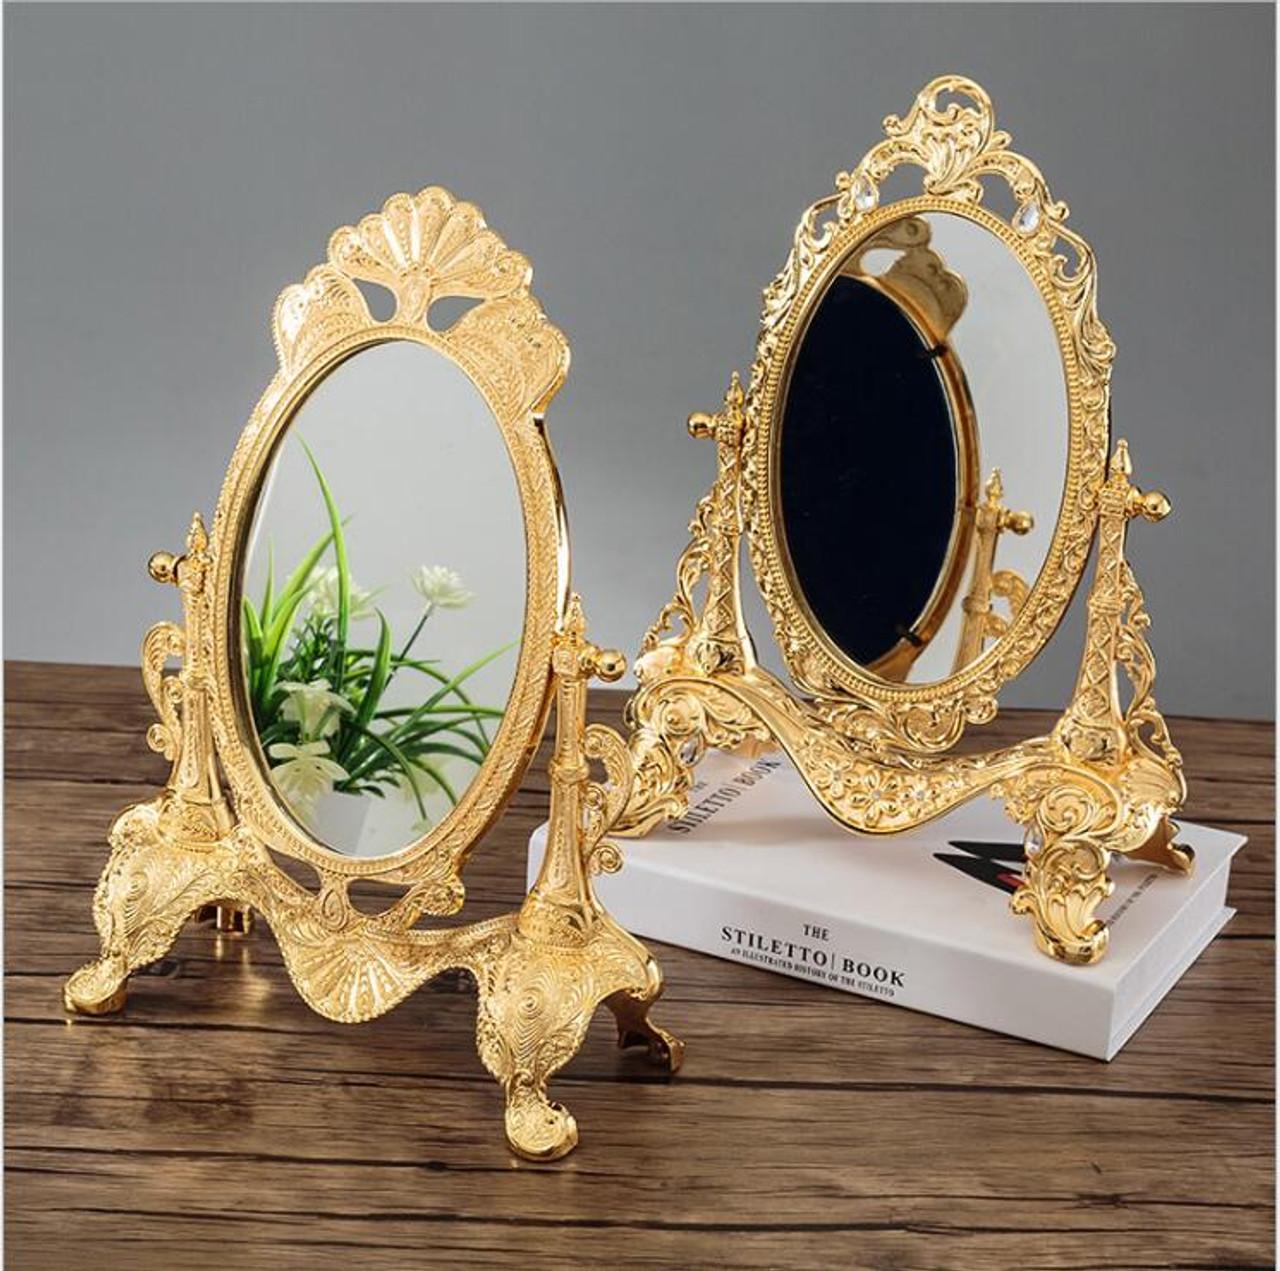 Europe 360 Rotating Sliver Gold Color Desktop Mirror Zinc Alloy Metal Vintage Vanity Mirror Wedding Home Decorative Mirrors J051 Onshopdeals Com